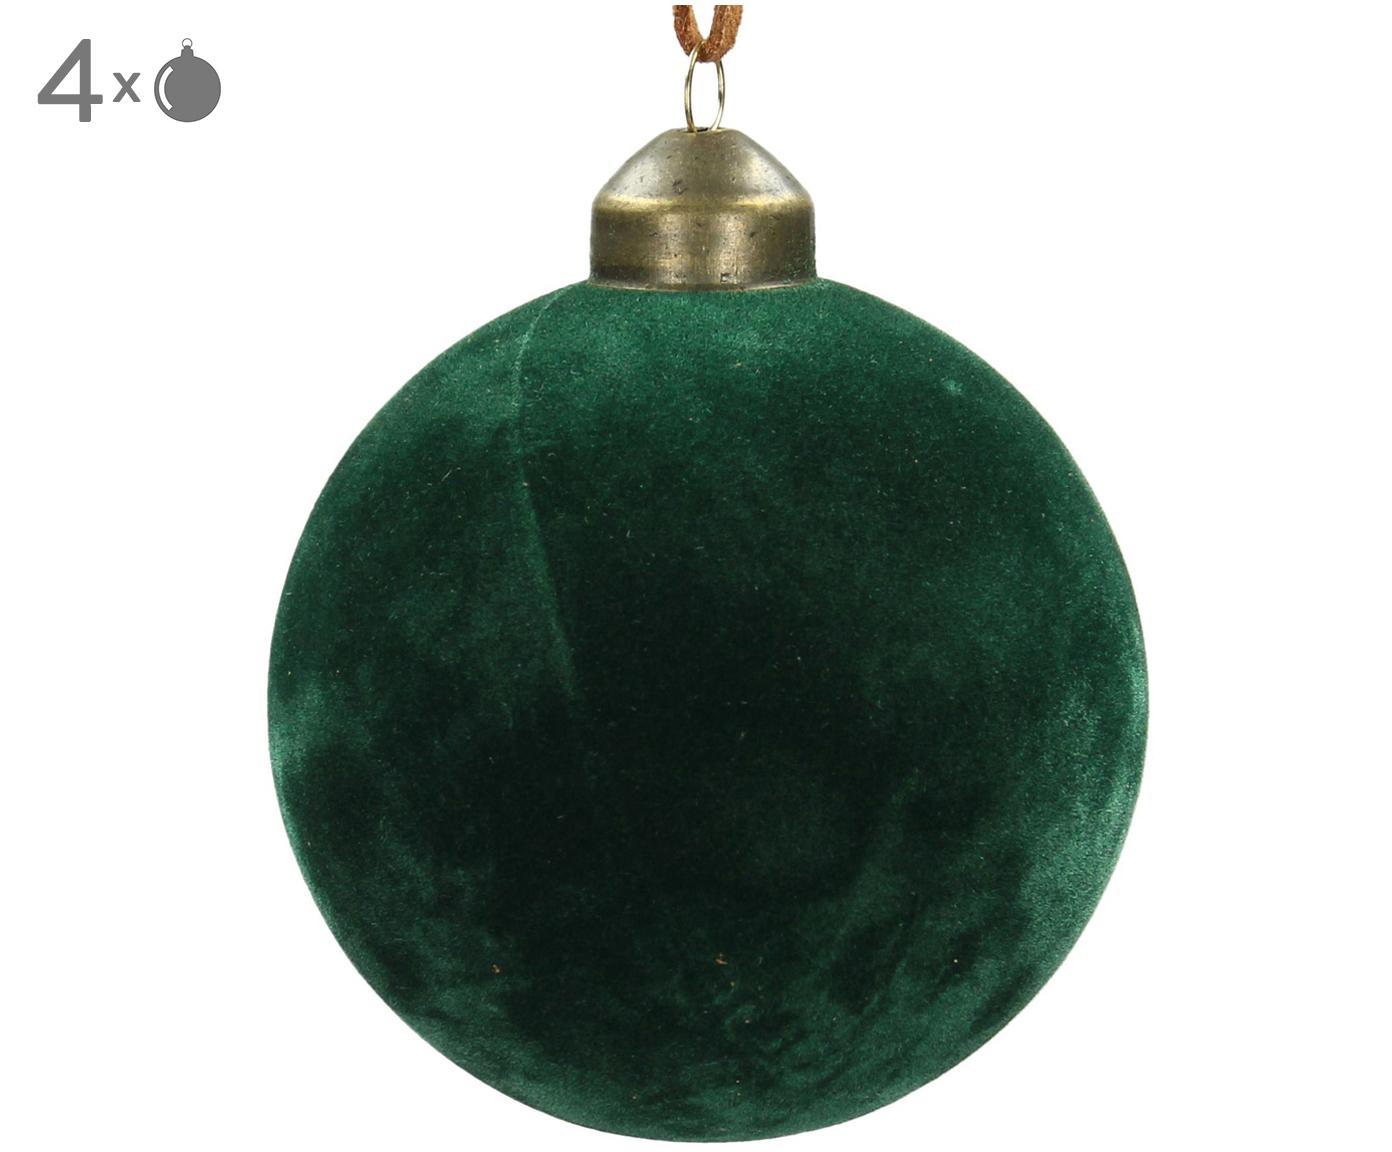 Bombka Velvet, 4 szt., Szkło, aksamit poliestrowy, Butelkowy zielony, Ø 8 cm